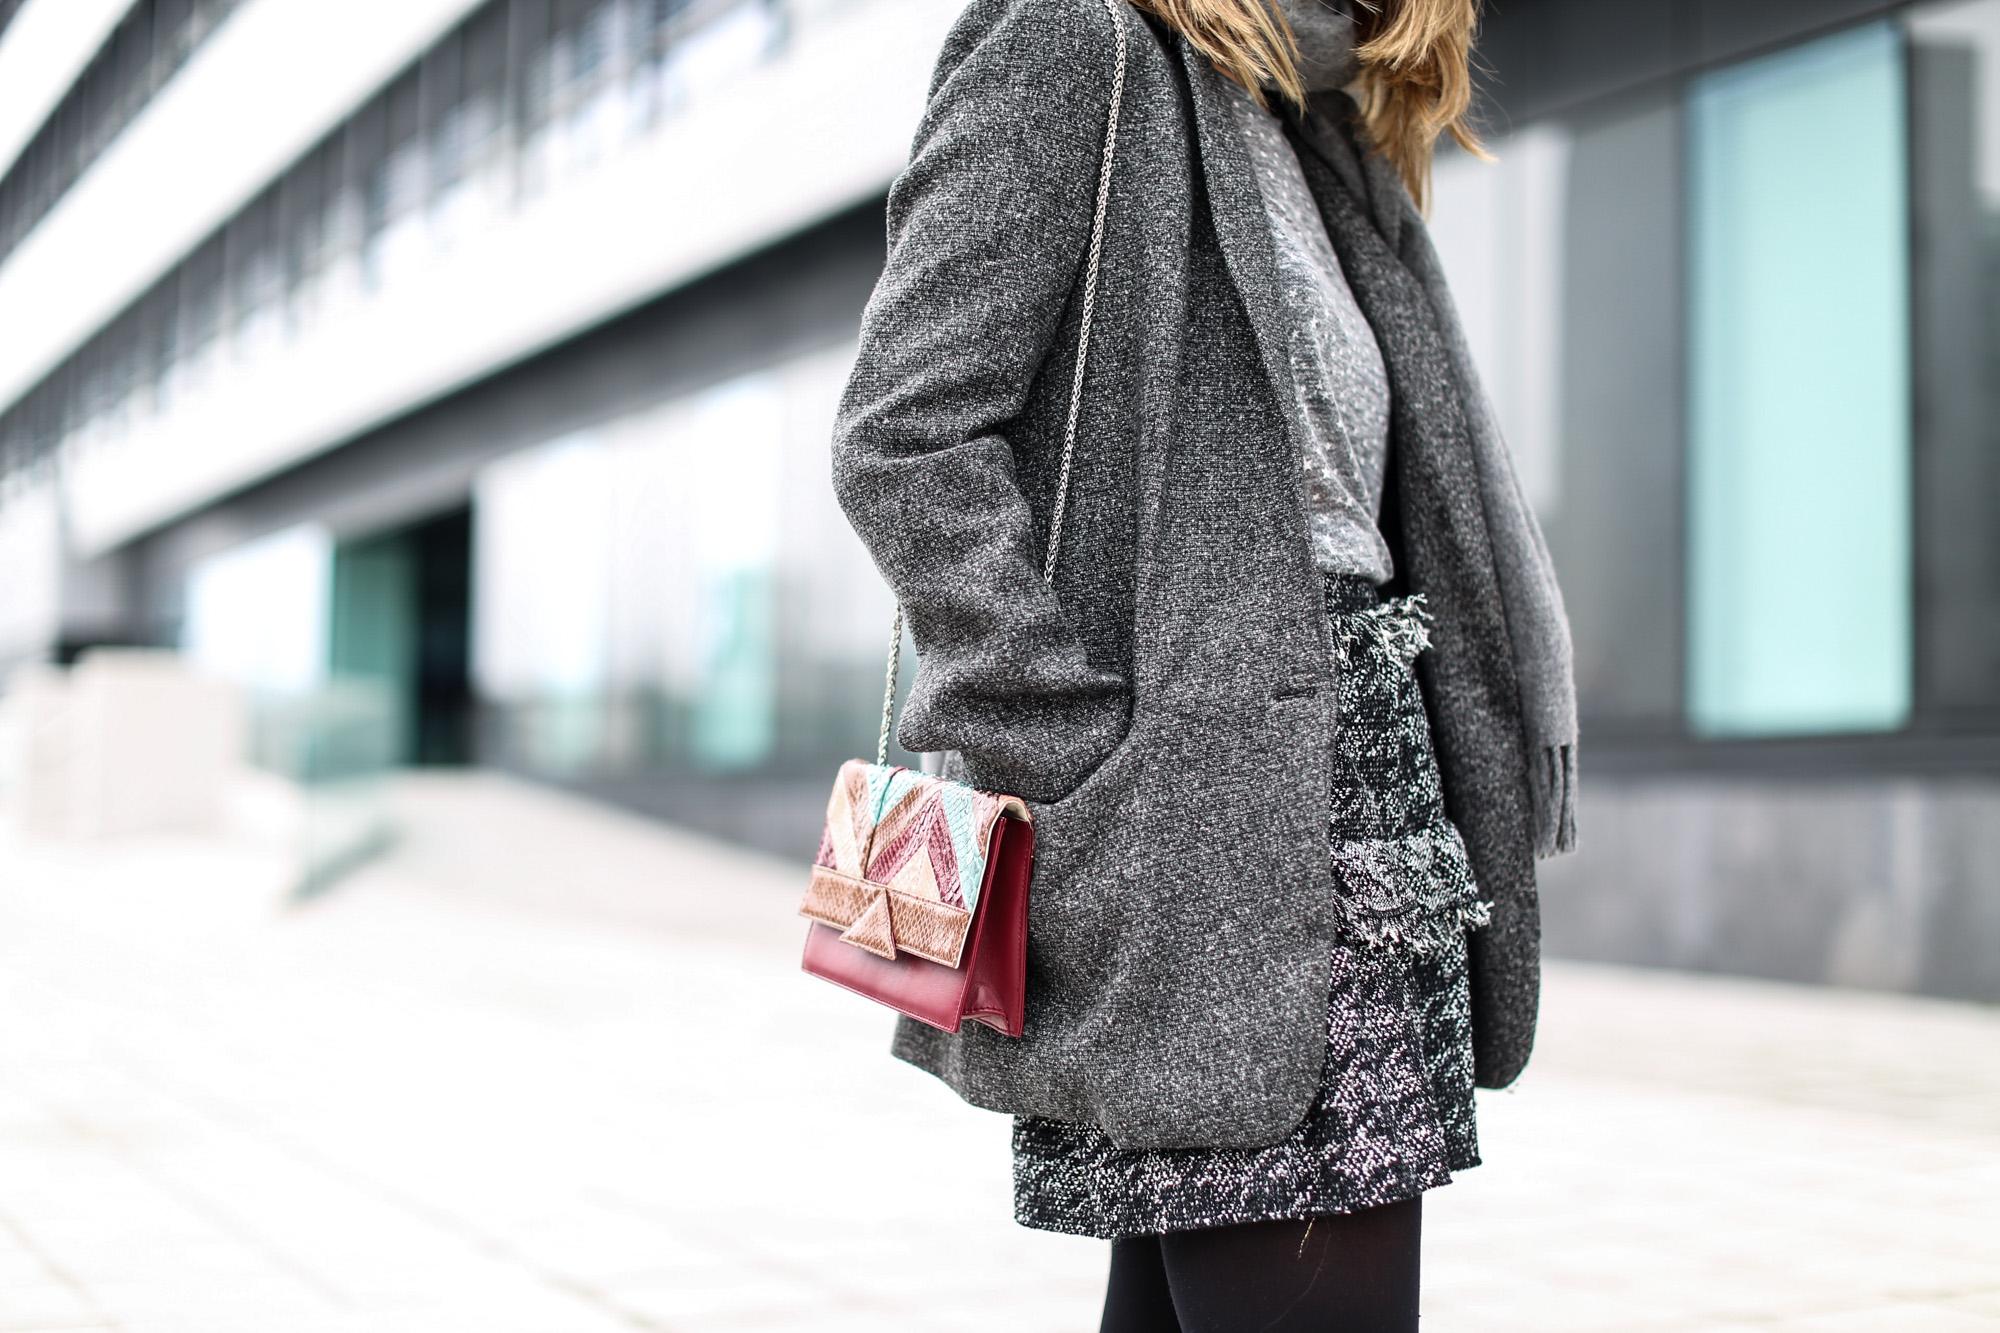 Clochet_streestyle_fashionblogger_minifaldatweedgriszara_botinesdickerisabelmarant_bolsospigatitamadrid_gafasdesolceline-5